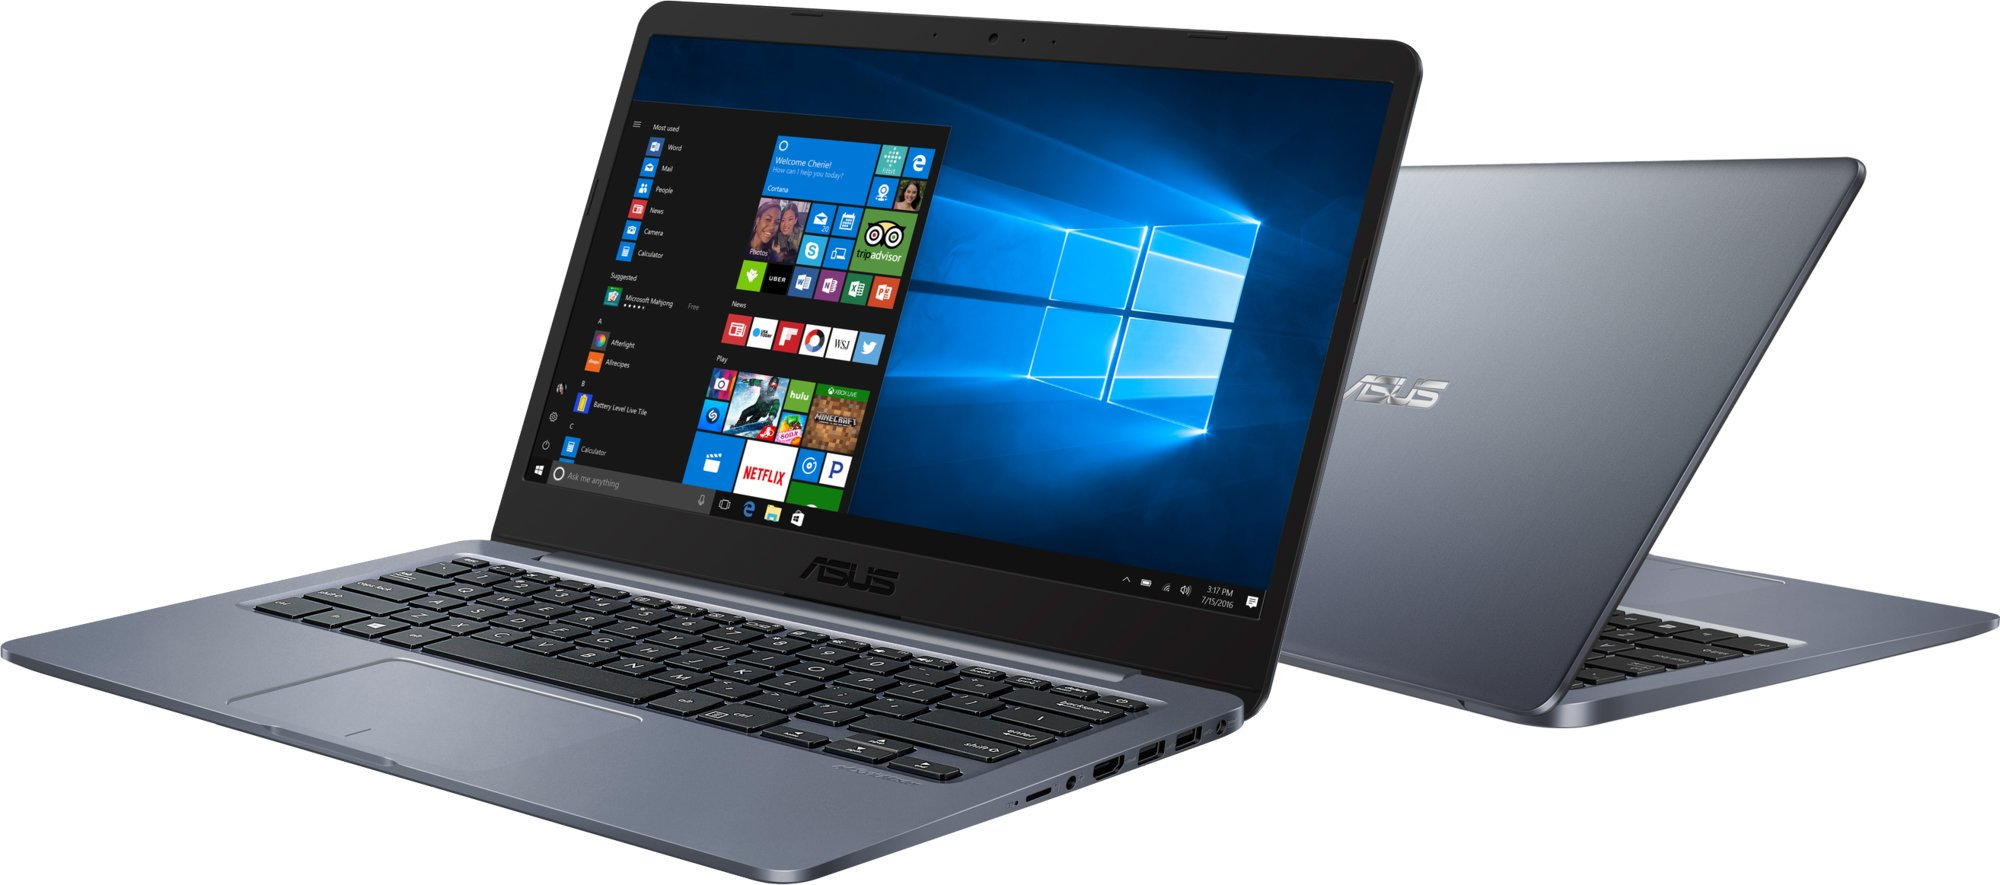 Asus VivoBook E406MA-EB021T